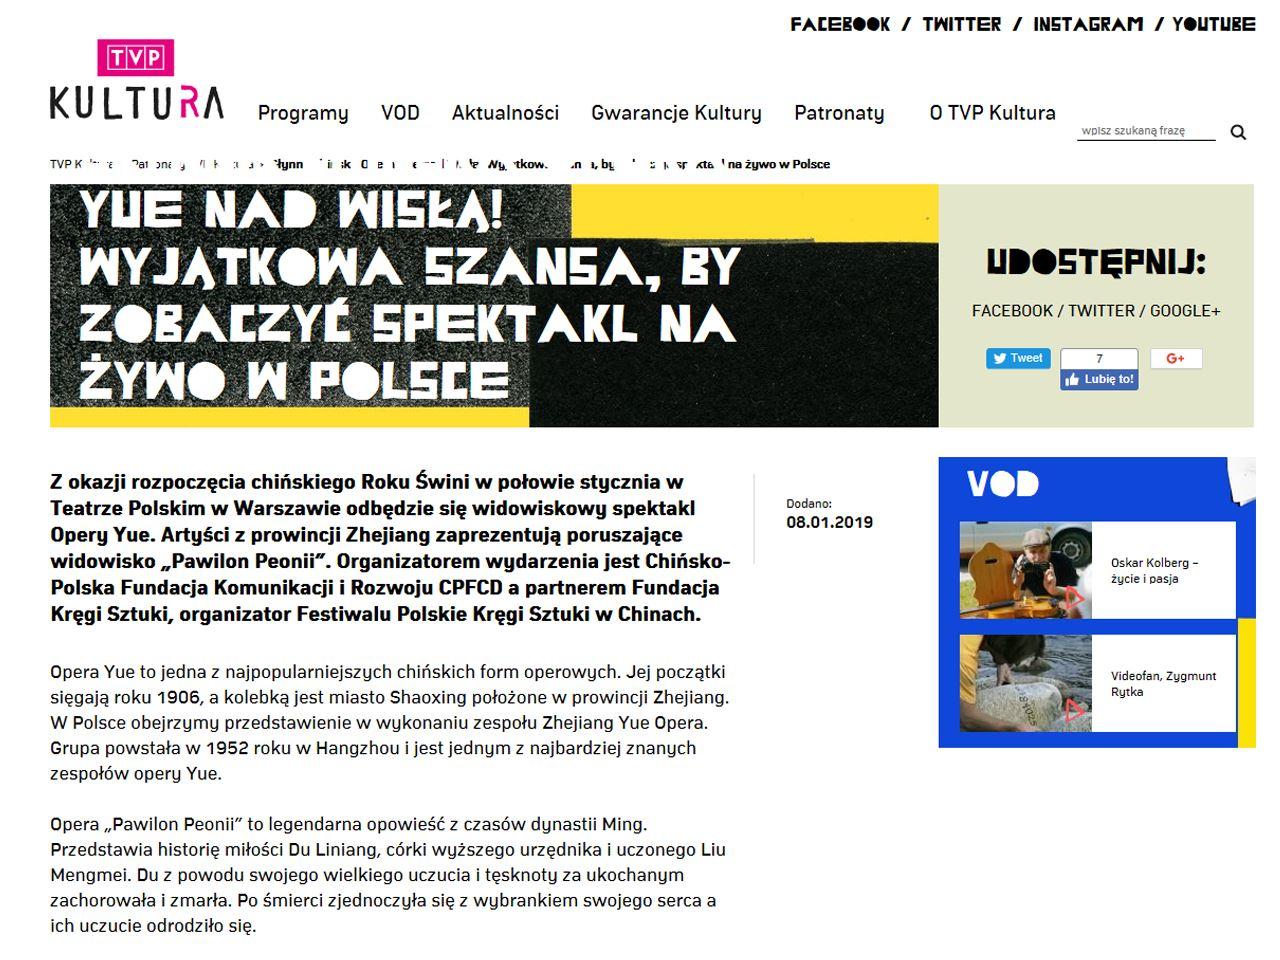 20190108_tvpkultura.tvp.pl